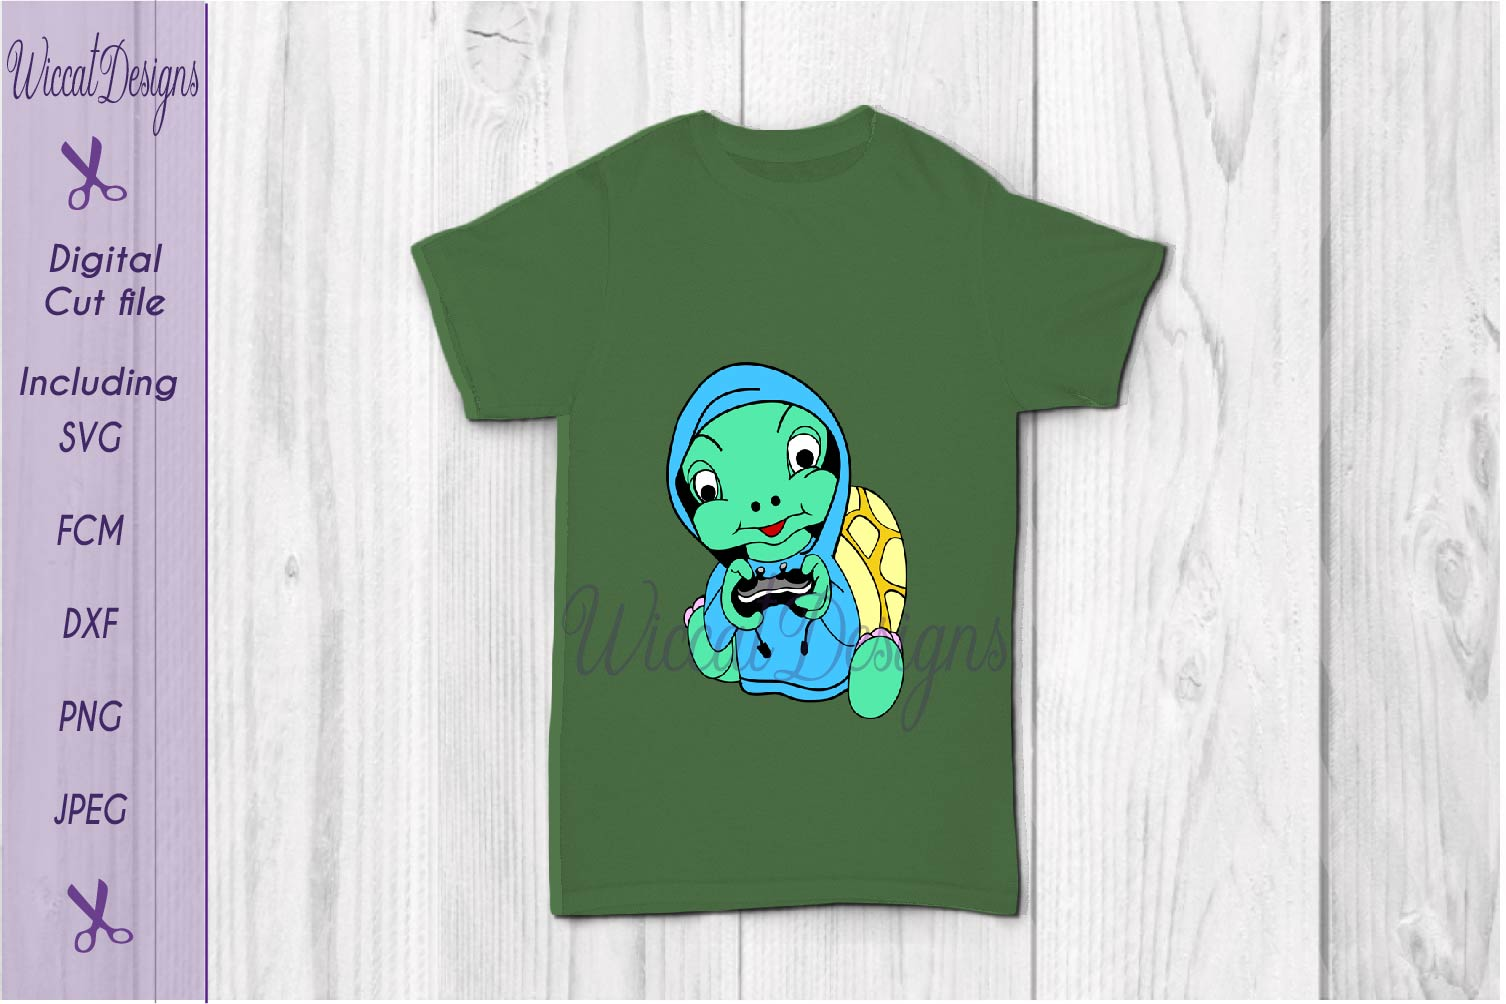 Turtle svg, gaming svg, kids shirt svg, hoodie svg, vinyl cut file example image 3